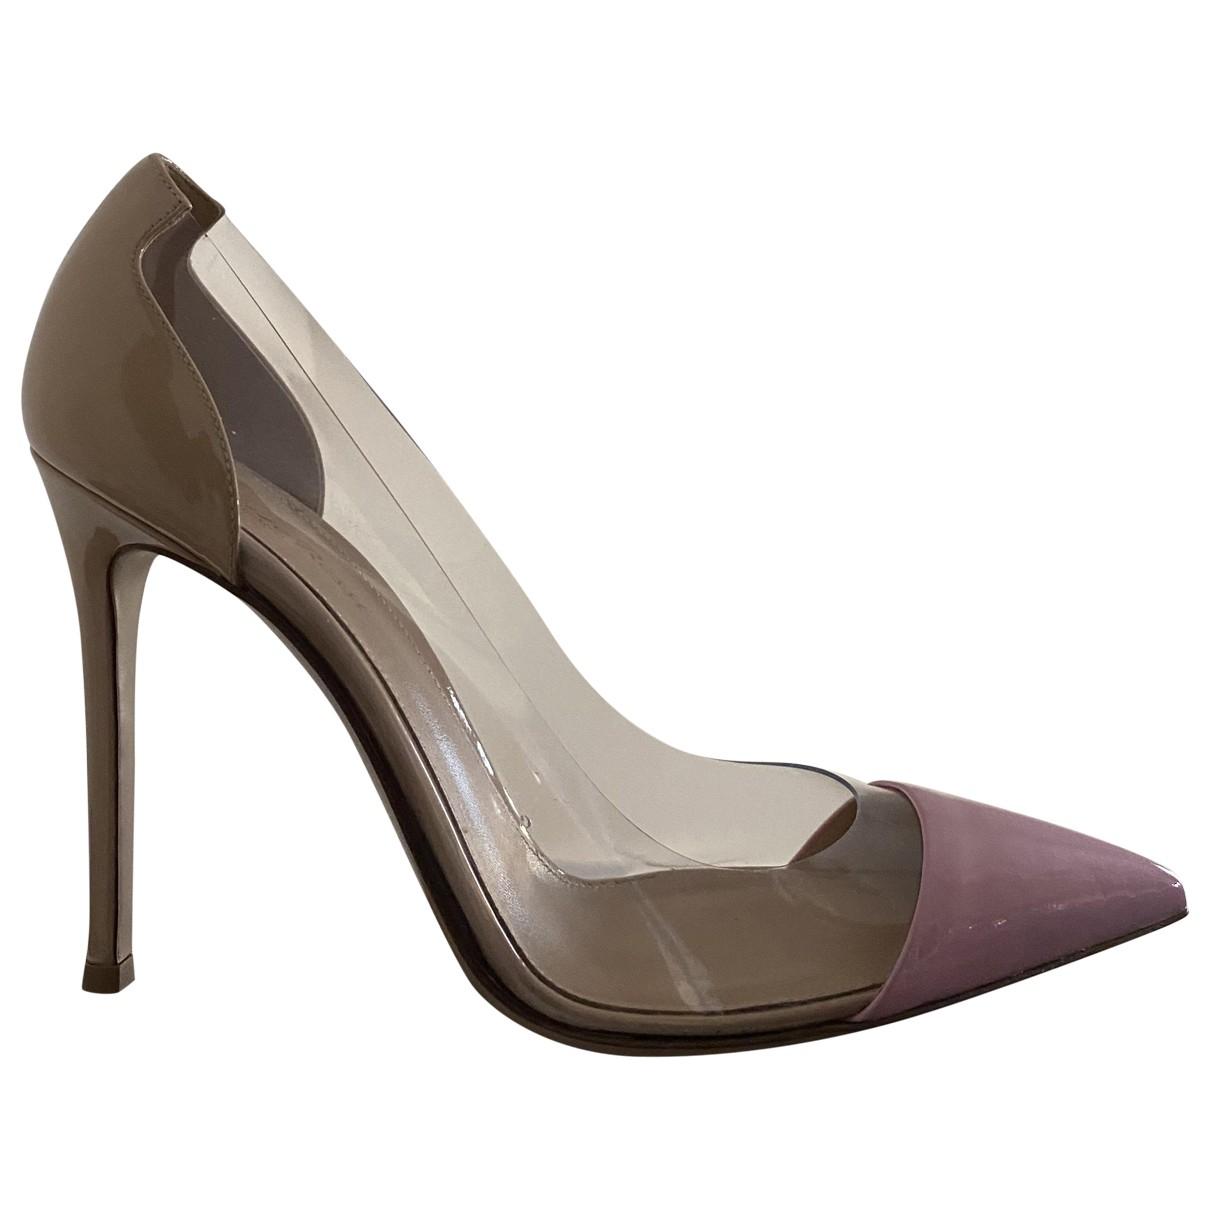 Gianvito Rossi - Escarpins Plexi pour femme en cuir verni - beige